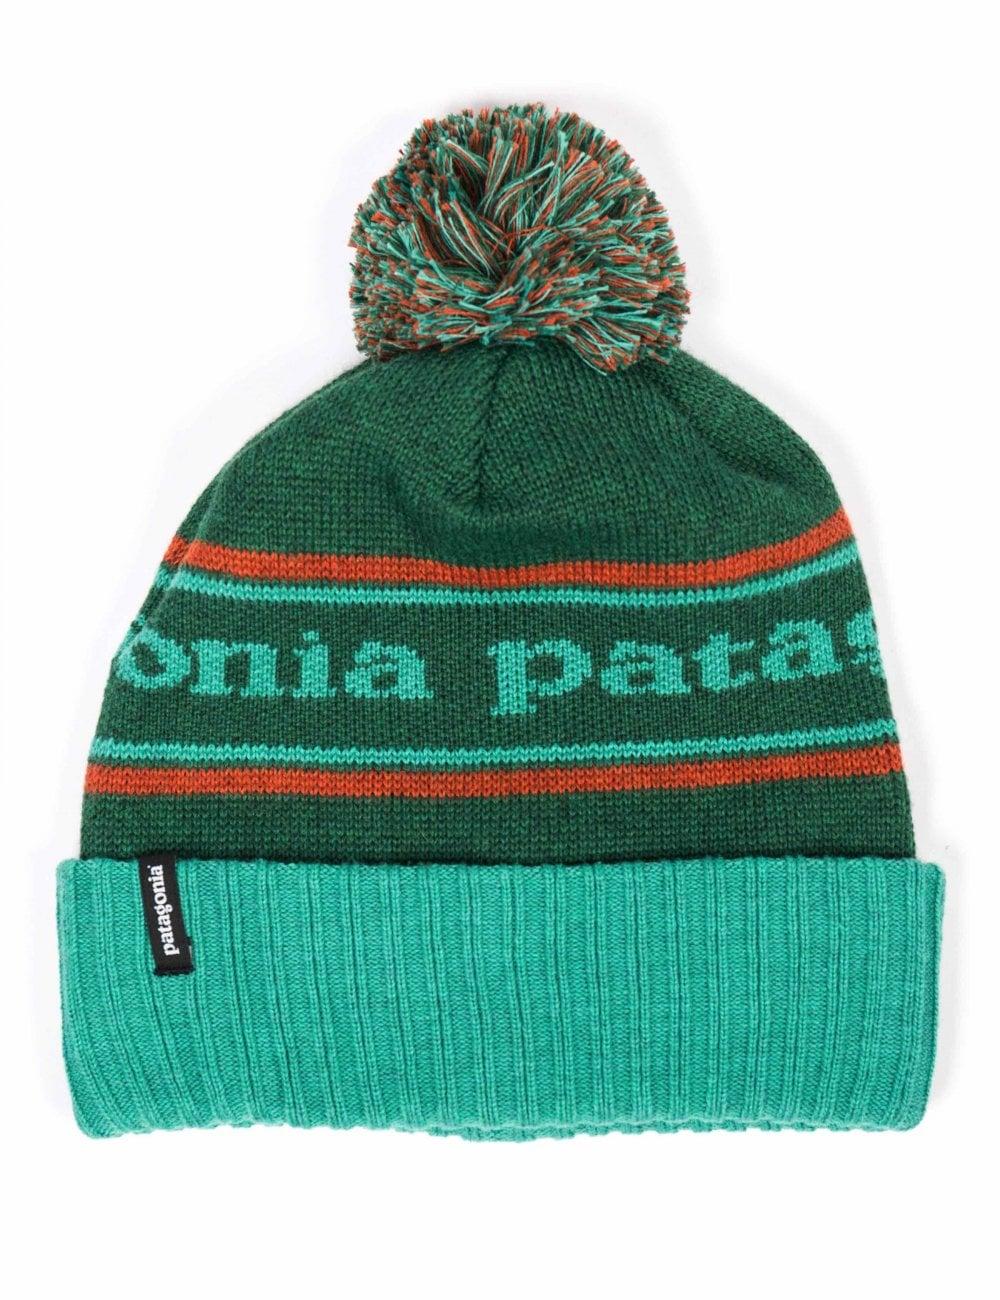 Patagonia Powder Town Beanie Hat - Park Stripe  Beryl Green ... 9e75725de44b